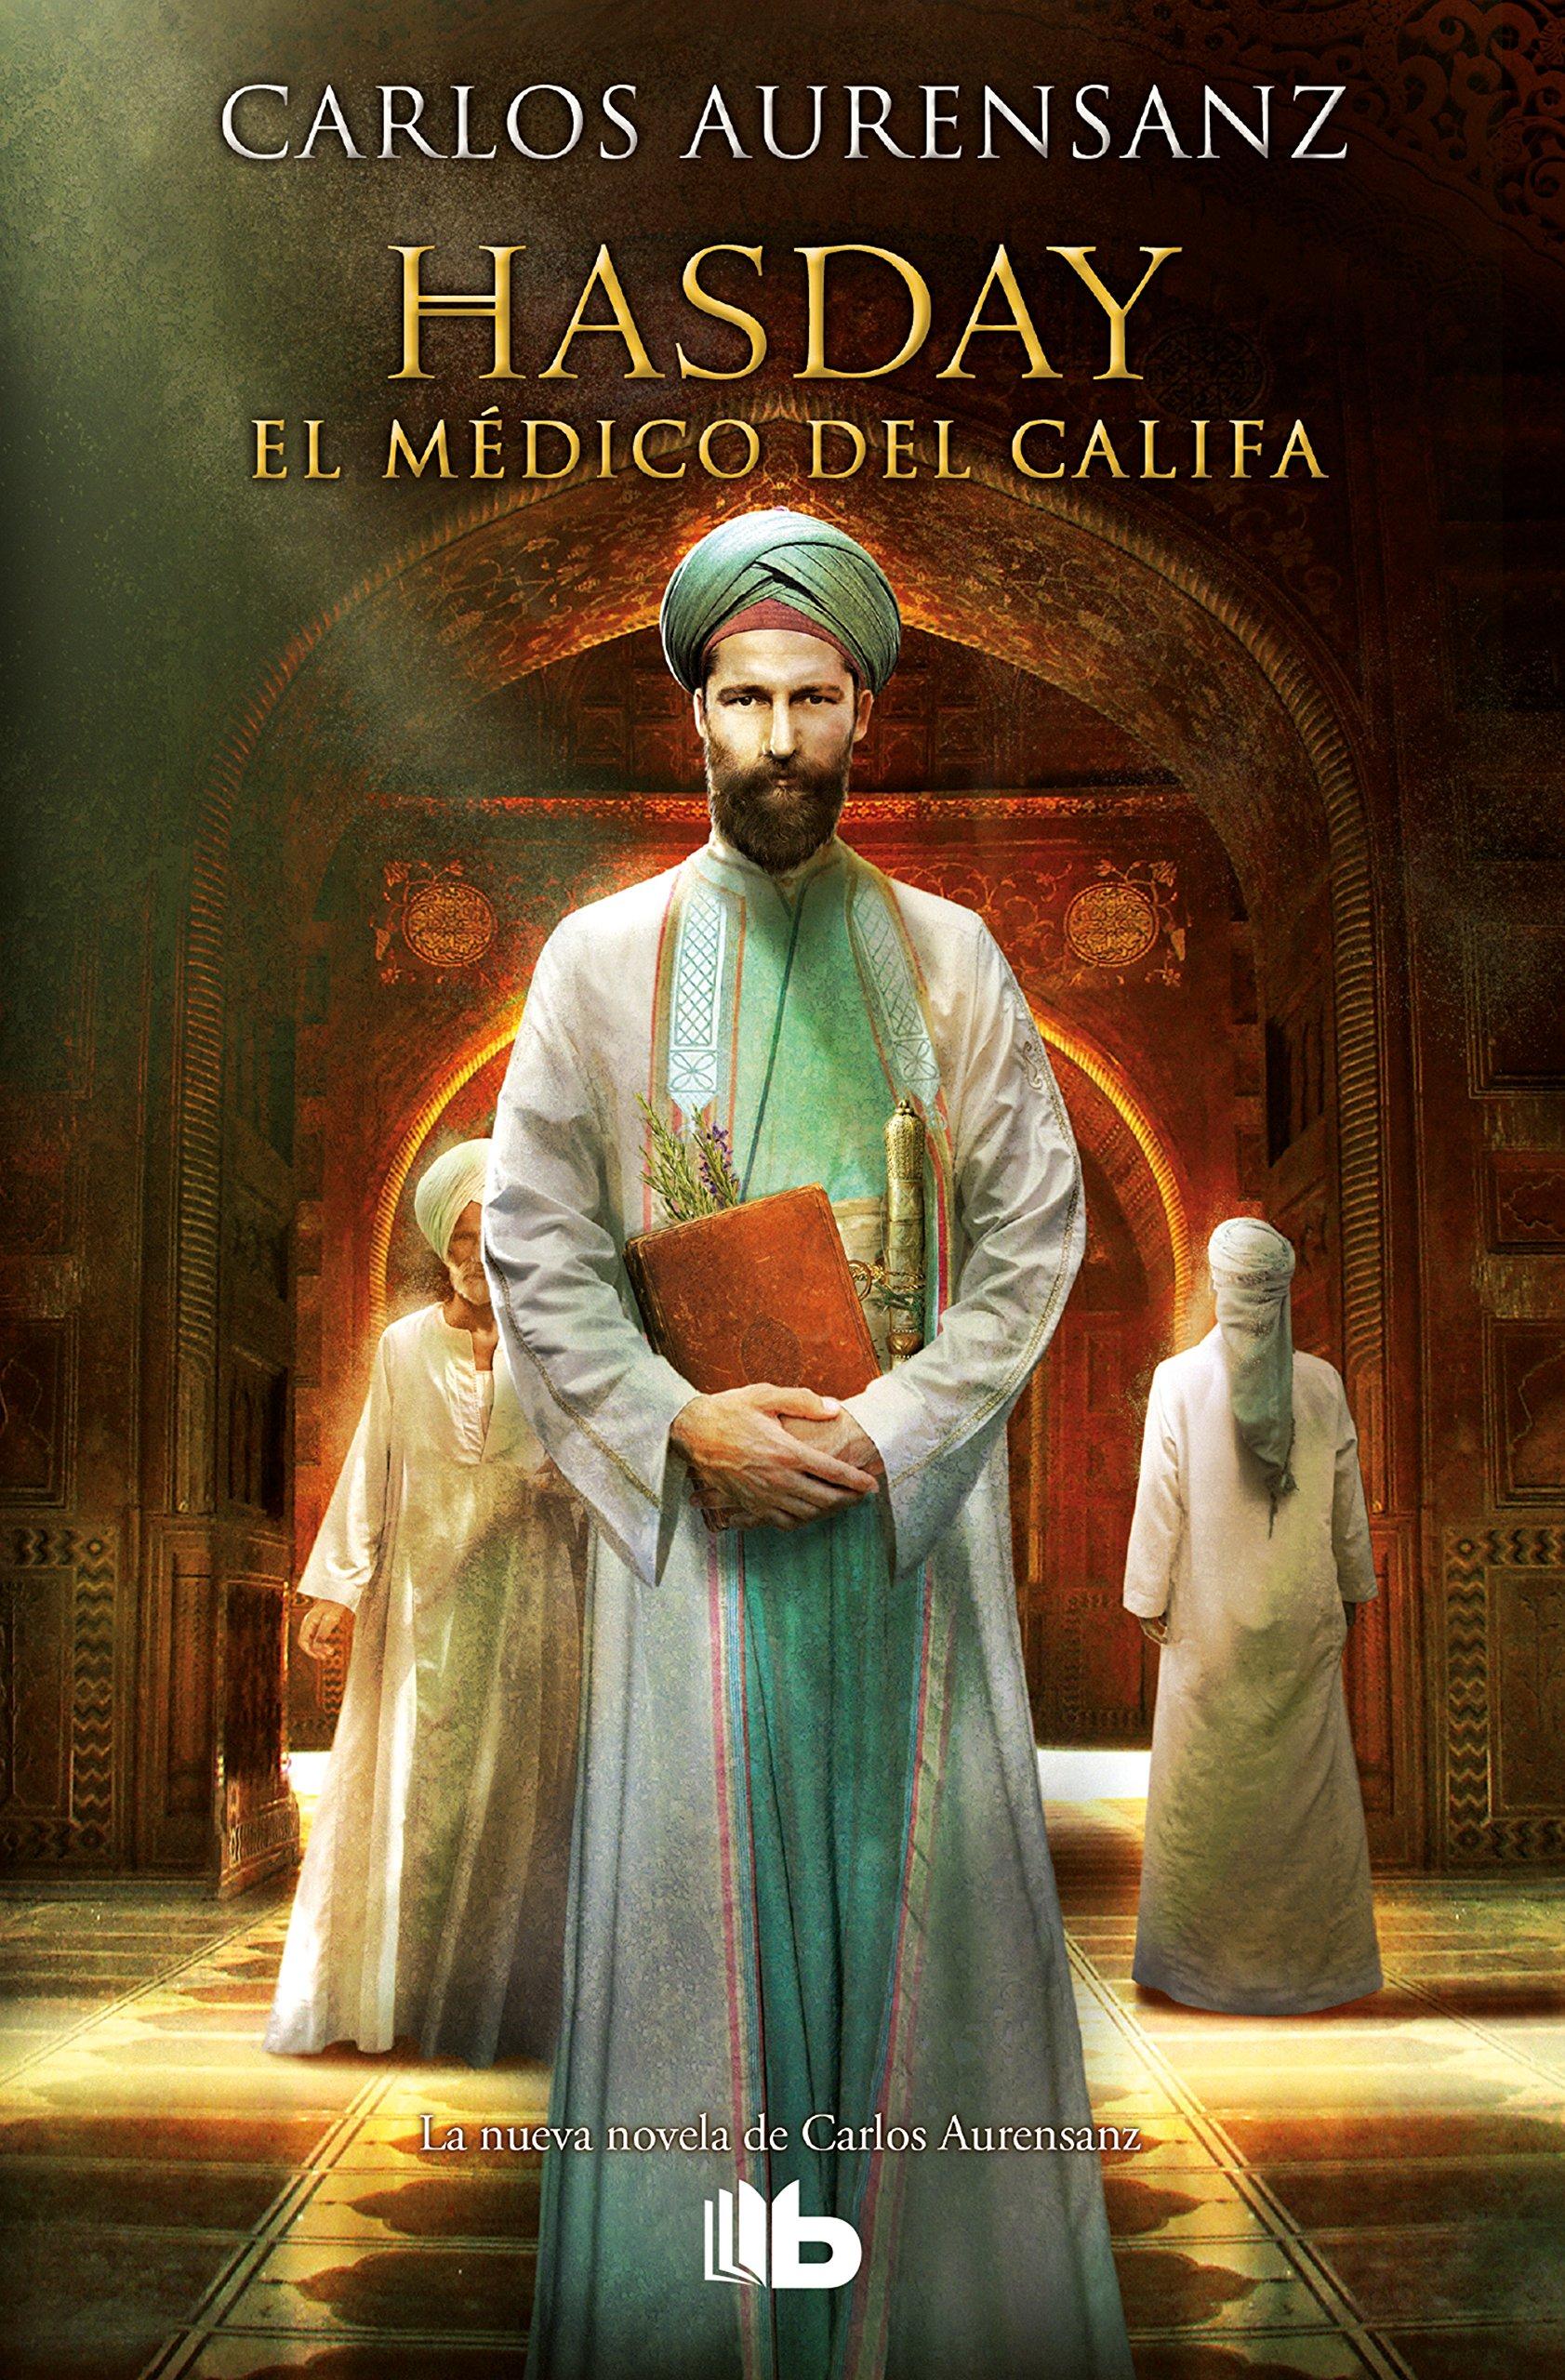 Hasday, el médico del califa (B DE BOLSILLO TAPA DURA, Band 603003)